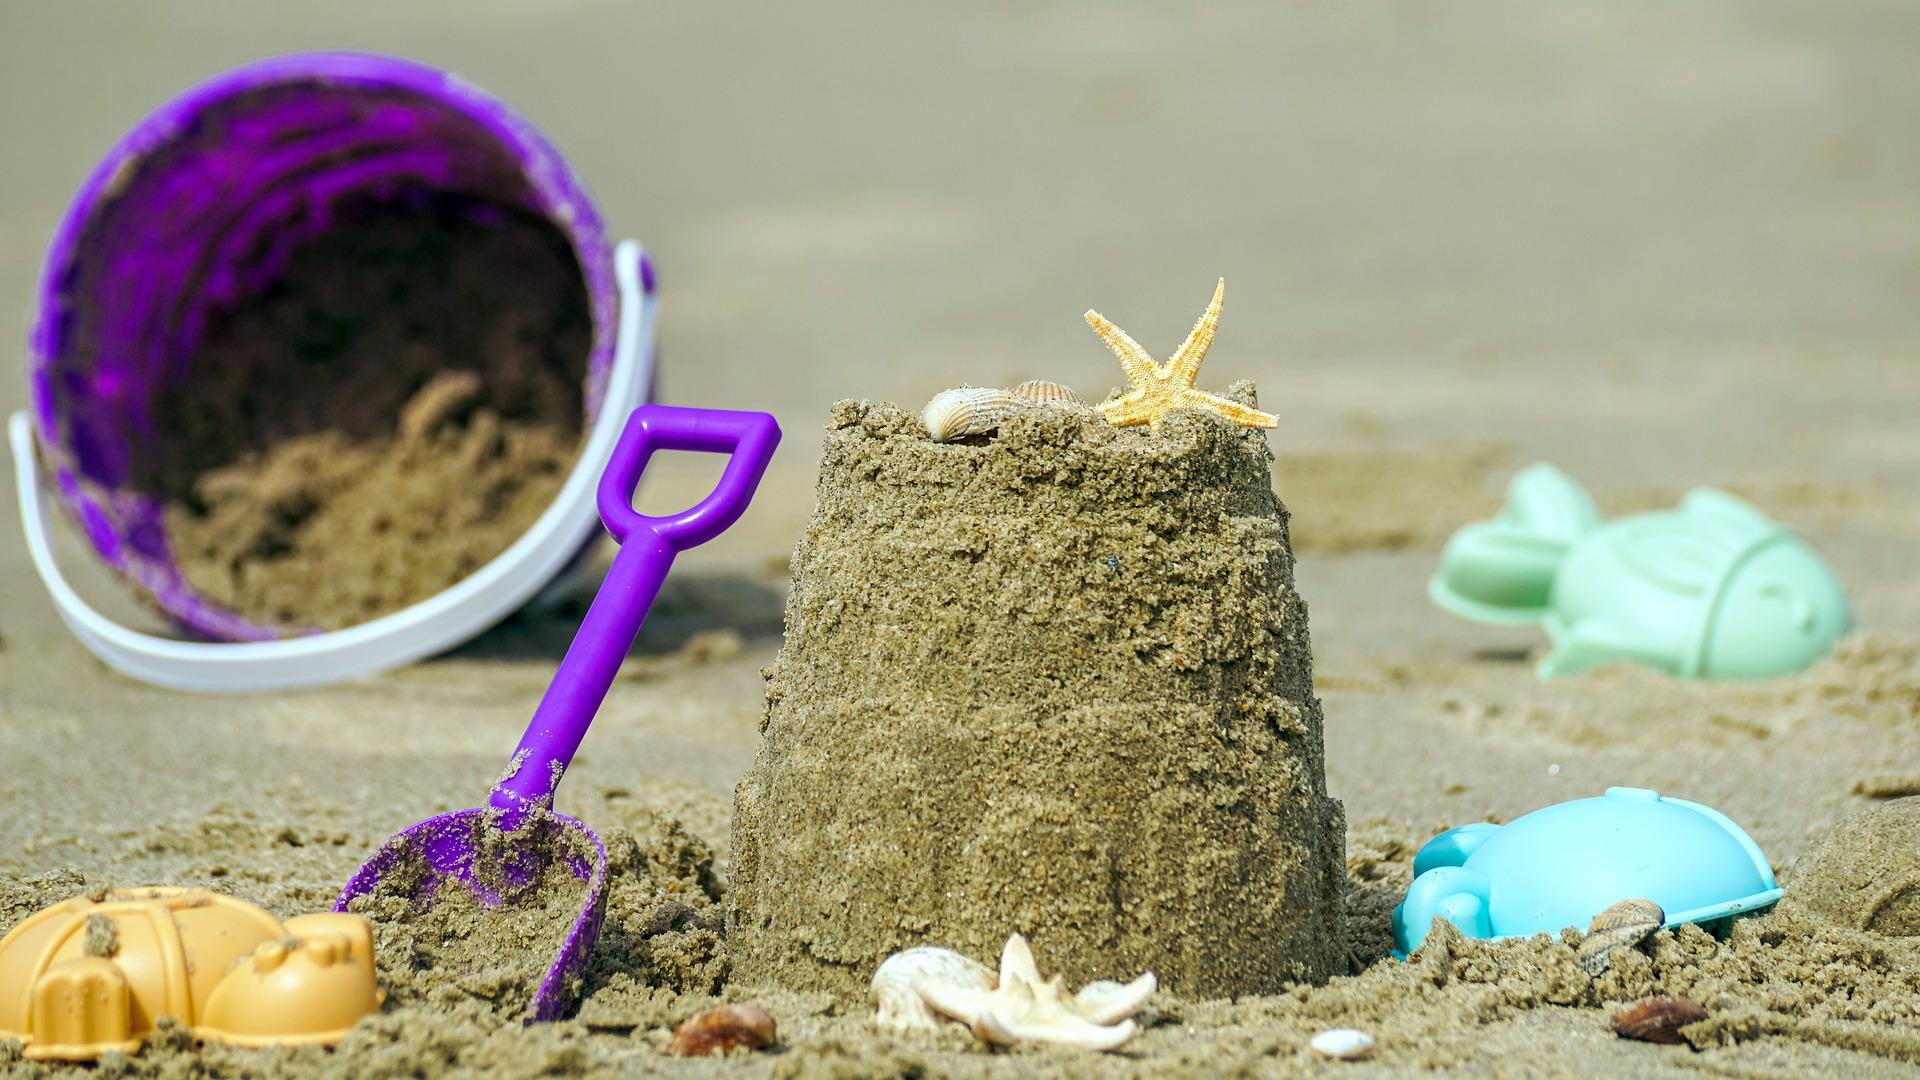 Imagem de brinquedos de praia coloridos de plástico